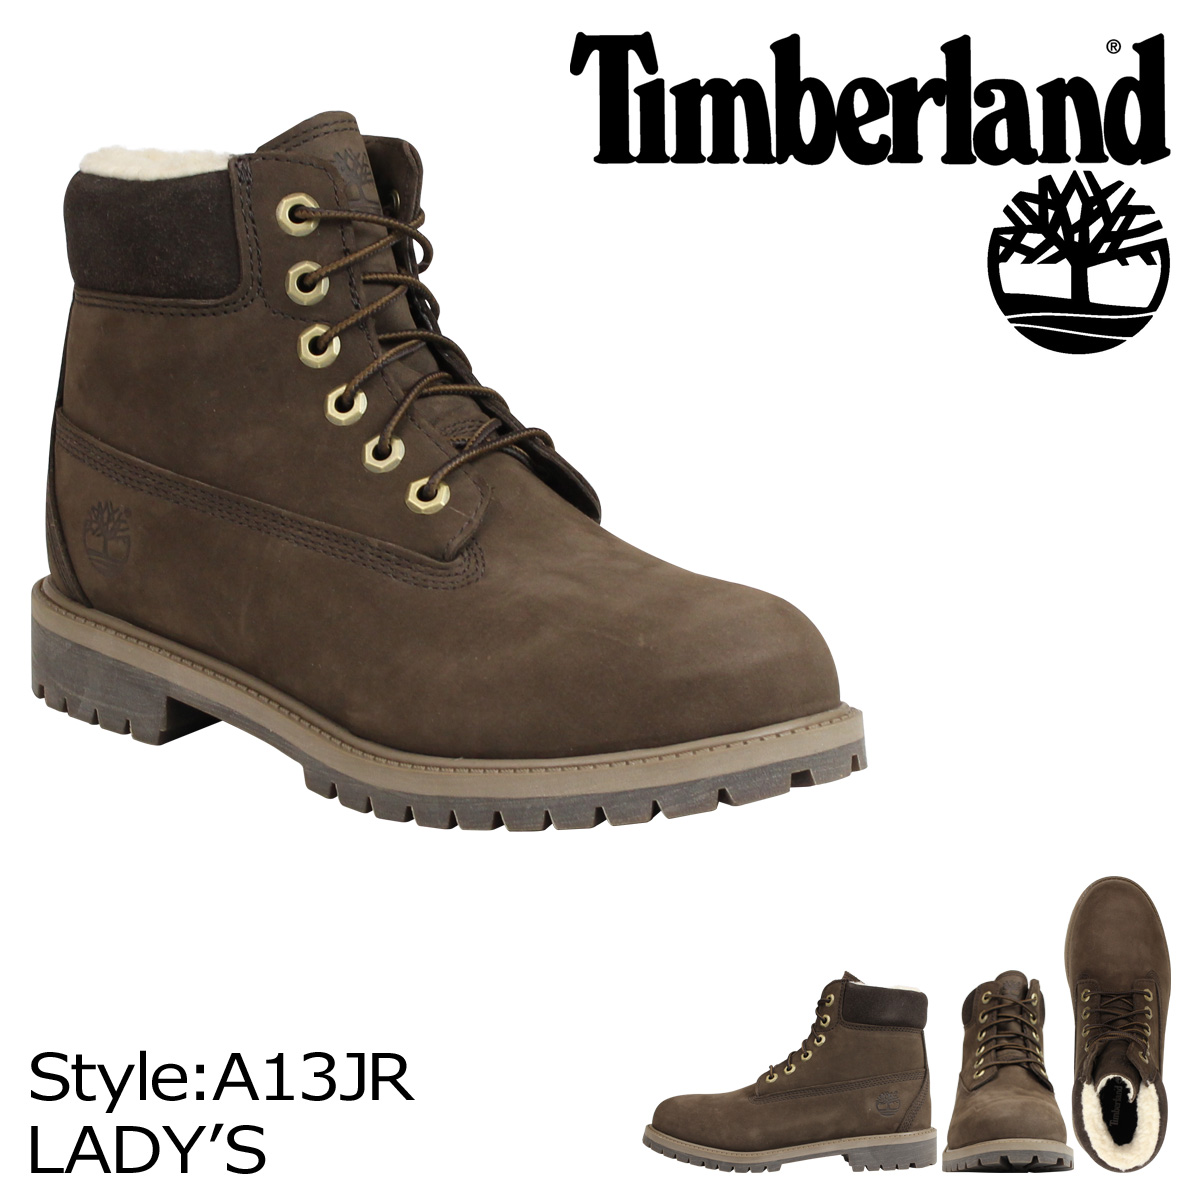 8e43c4eff60 Sugar Online Shop: Timberland-Timberland women's JUNIOR 6INCH PREMIUM WP BOOT  boots 6 inch premium waterproof A13JR Brown [10/15 new in stock]   Rakuten  ...